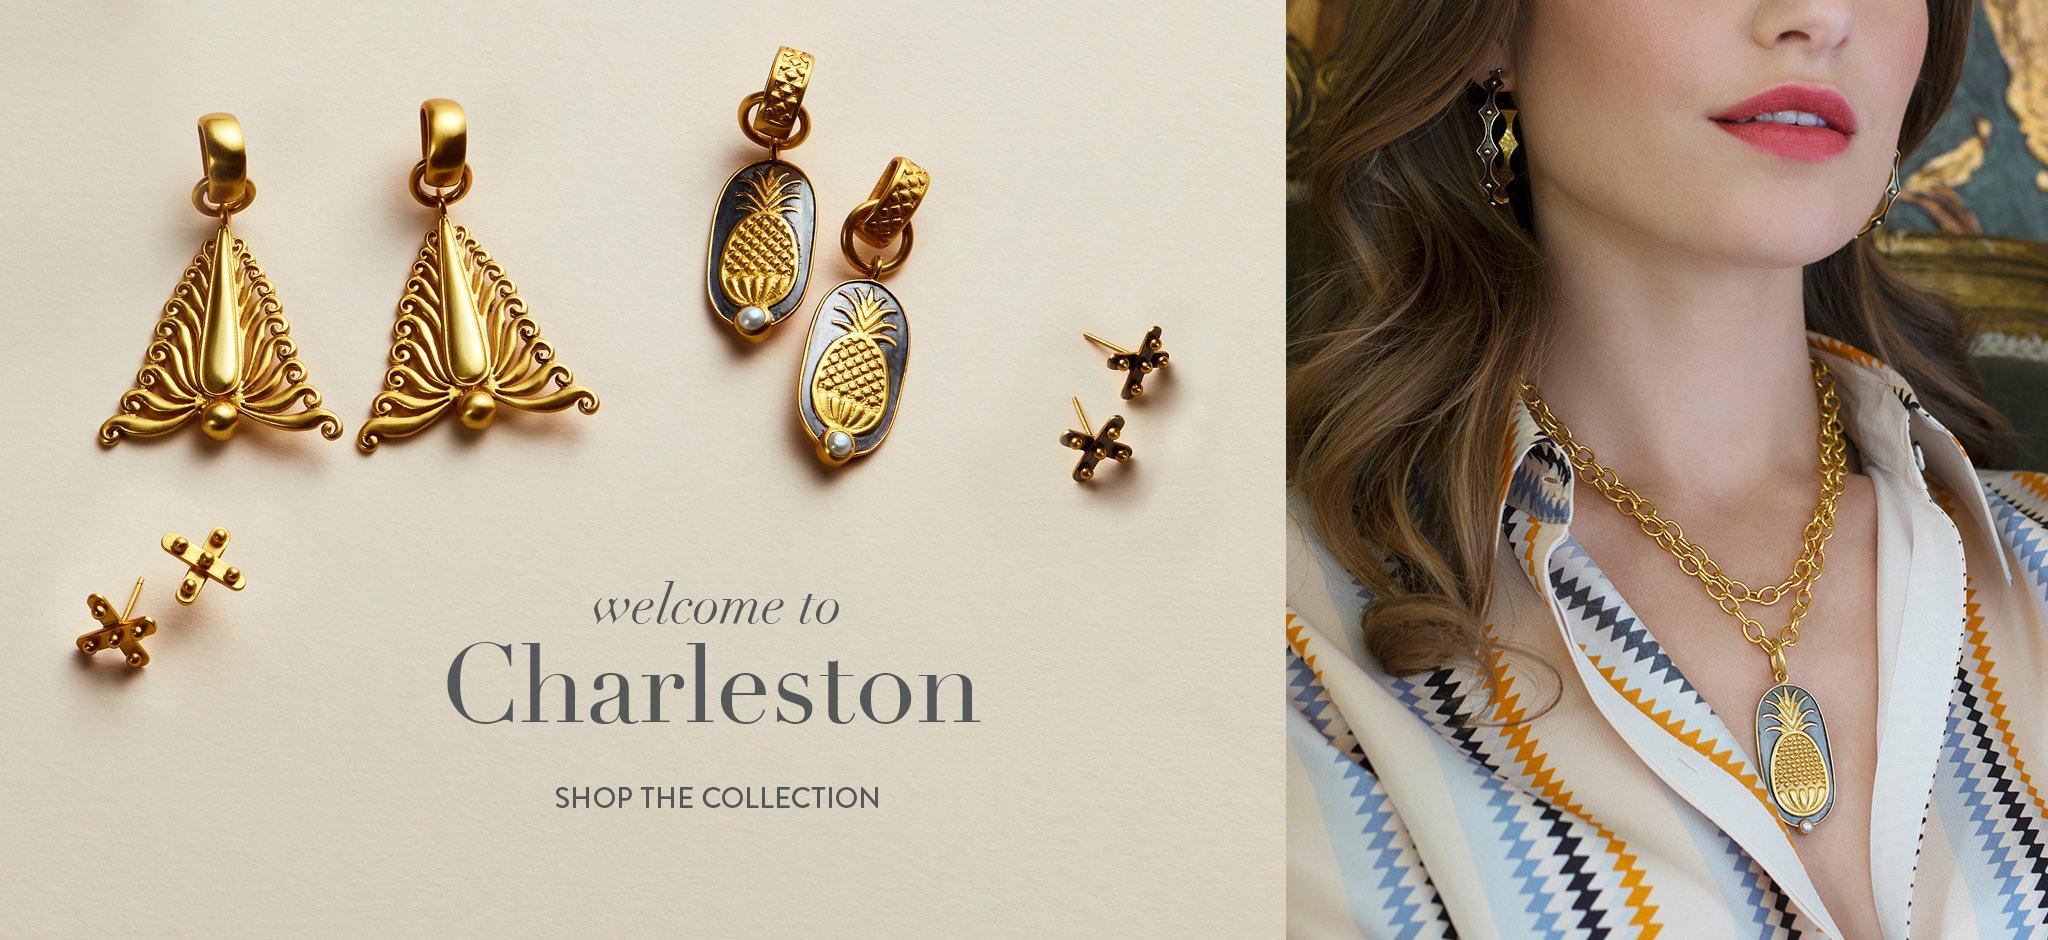 jewelry and fashion photographer freelance new york.jpg